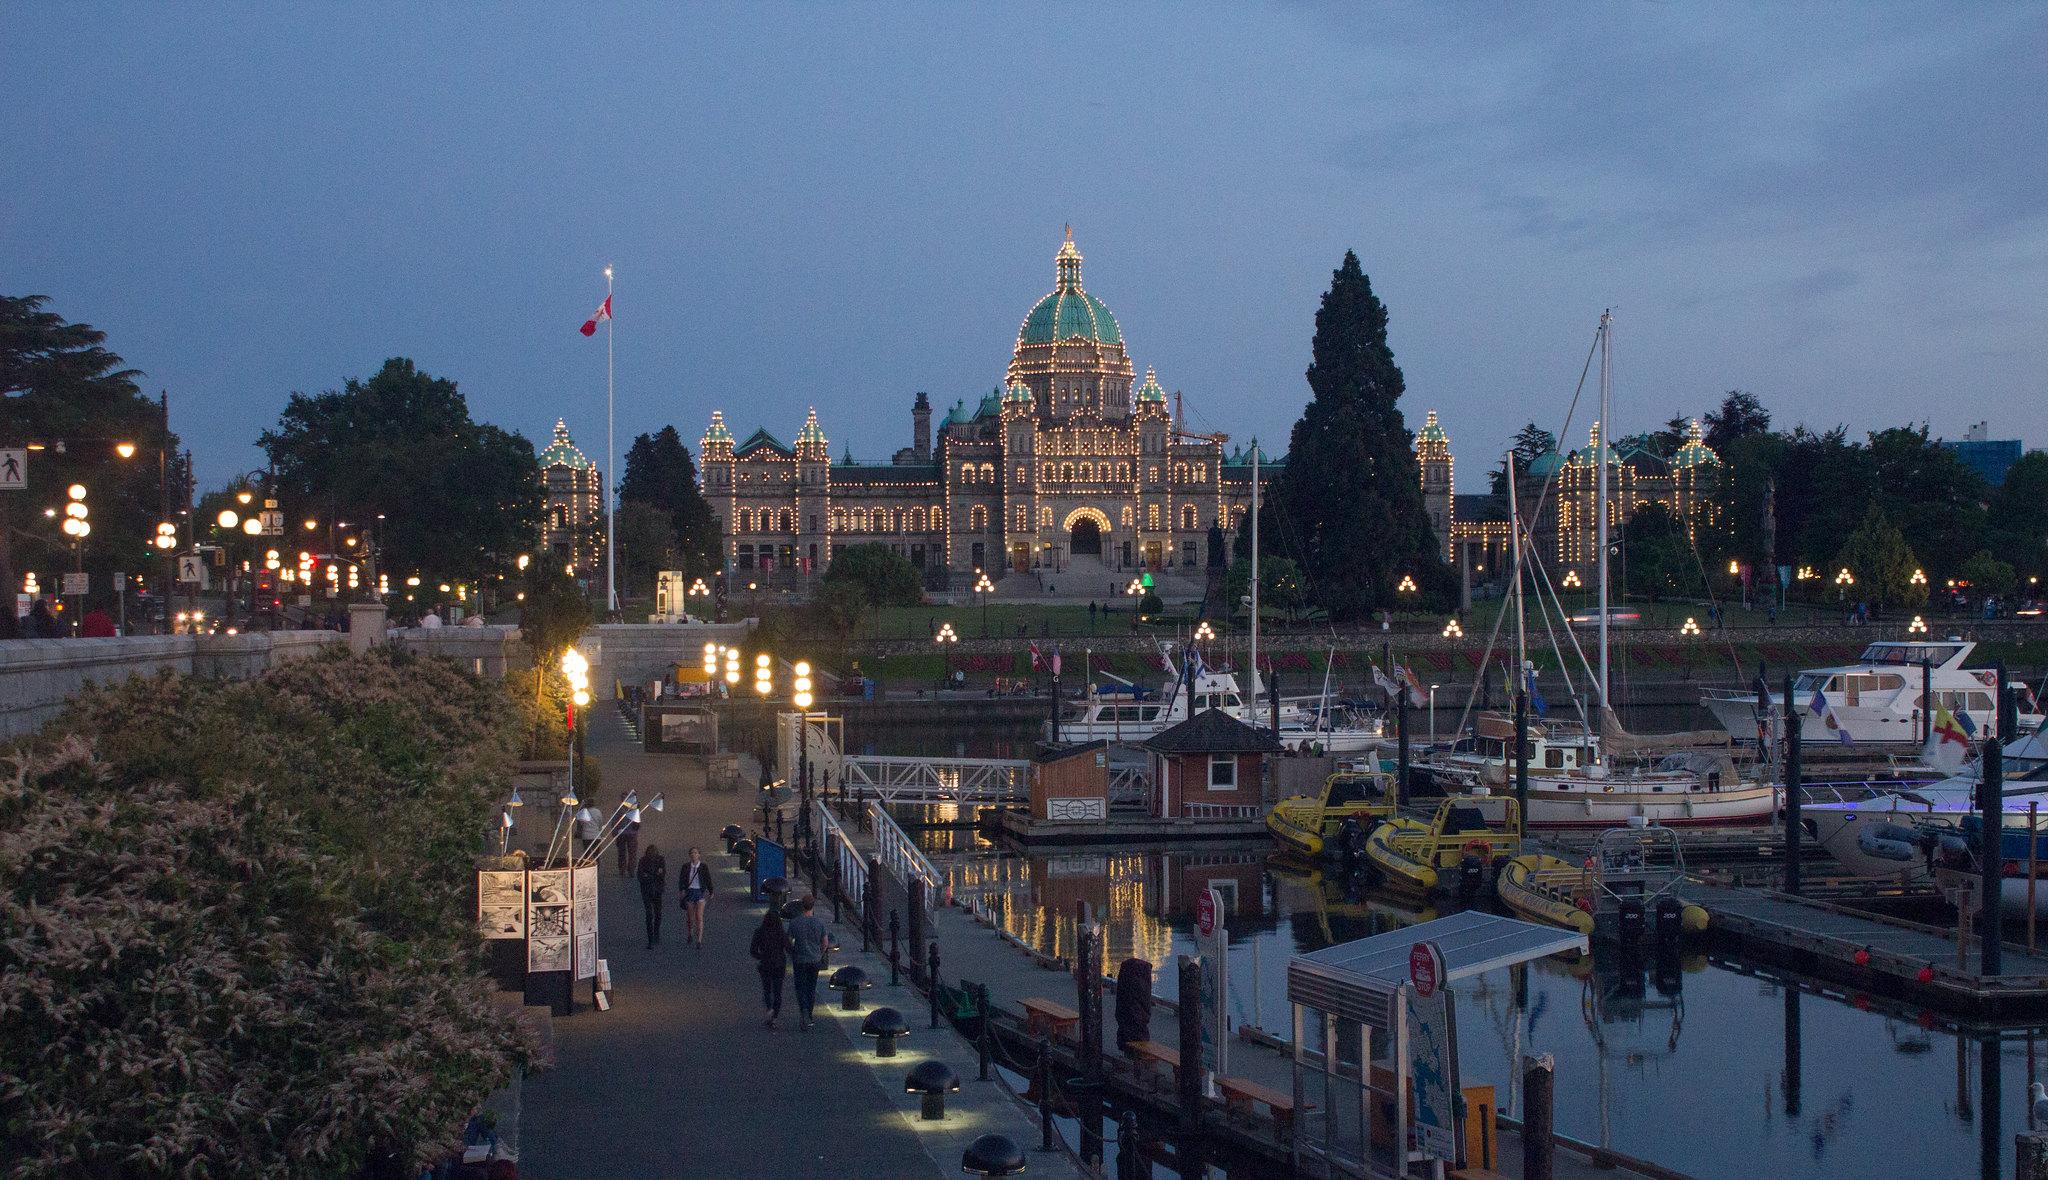 BC Parliament building, Victoria, Vancouver Island